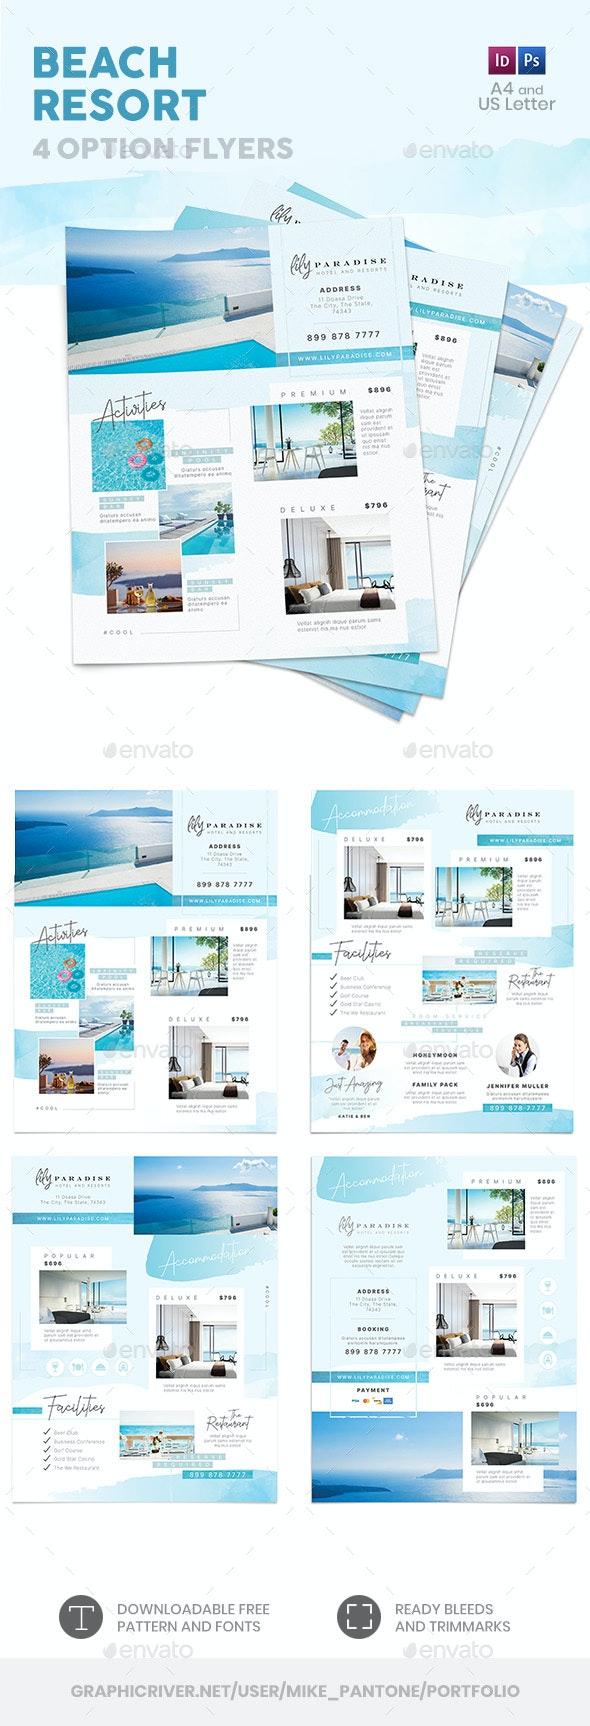 Beach Resort Flyers 3 – 4 Options - Commerce Flyers